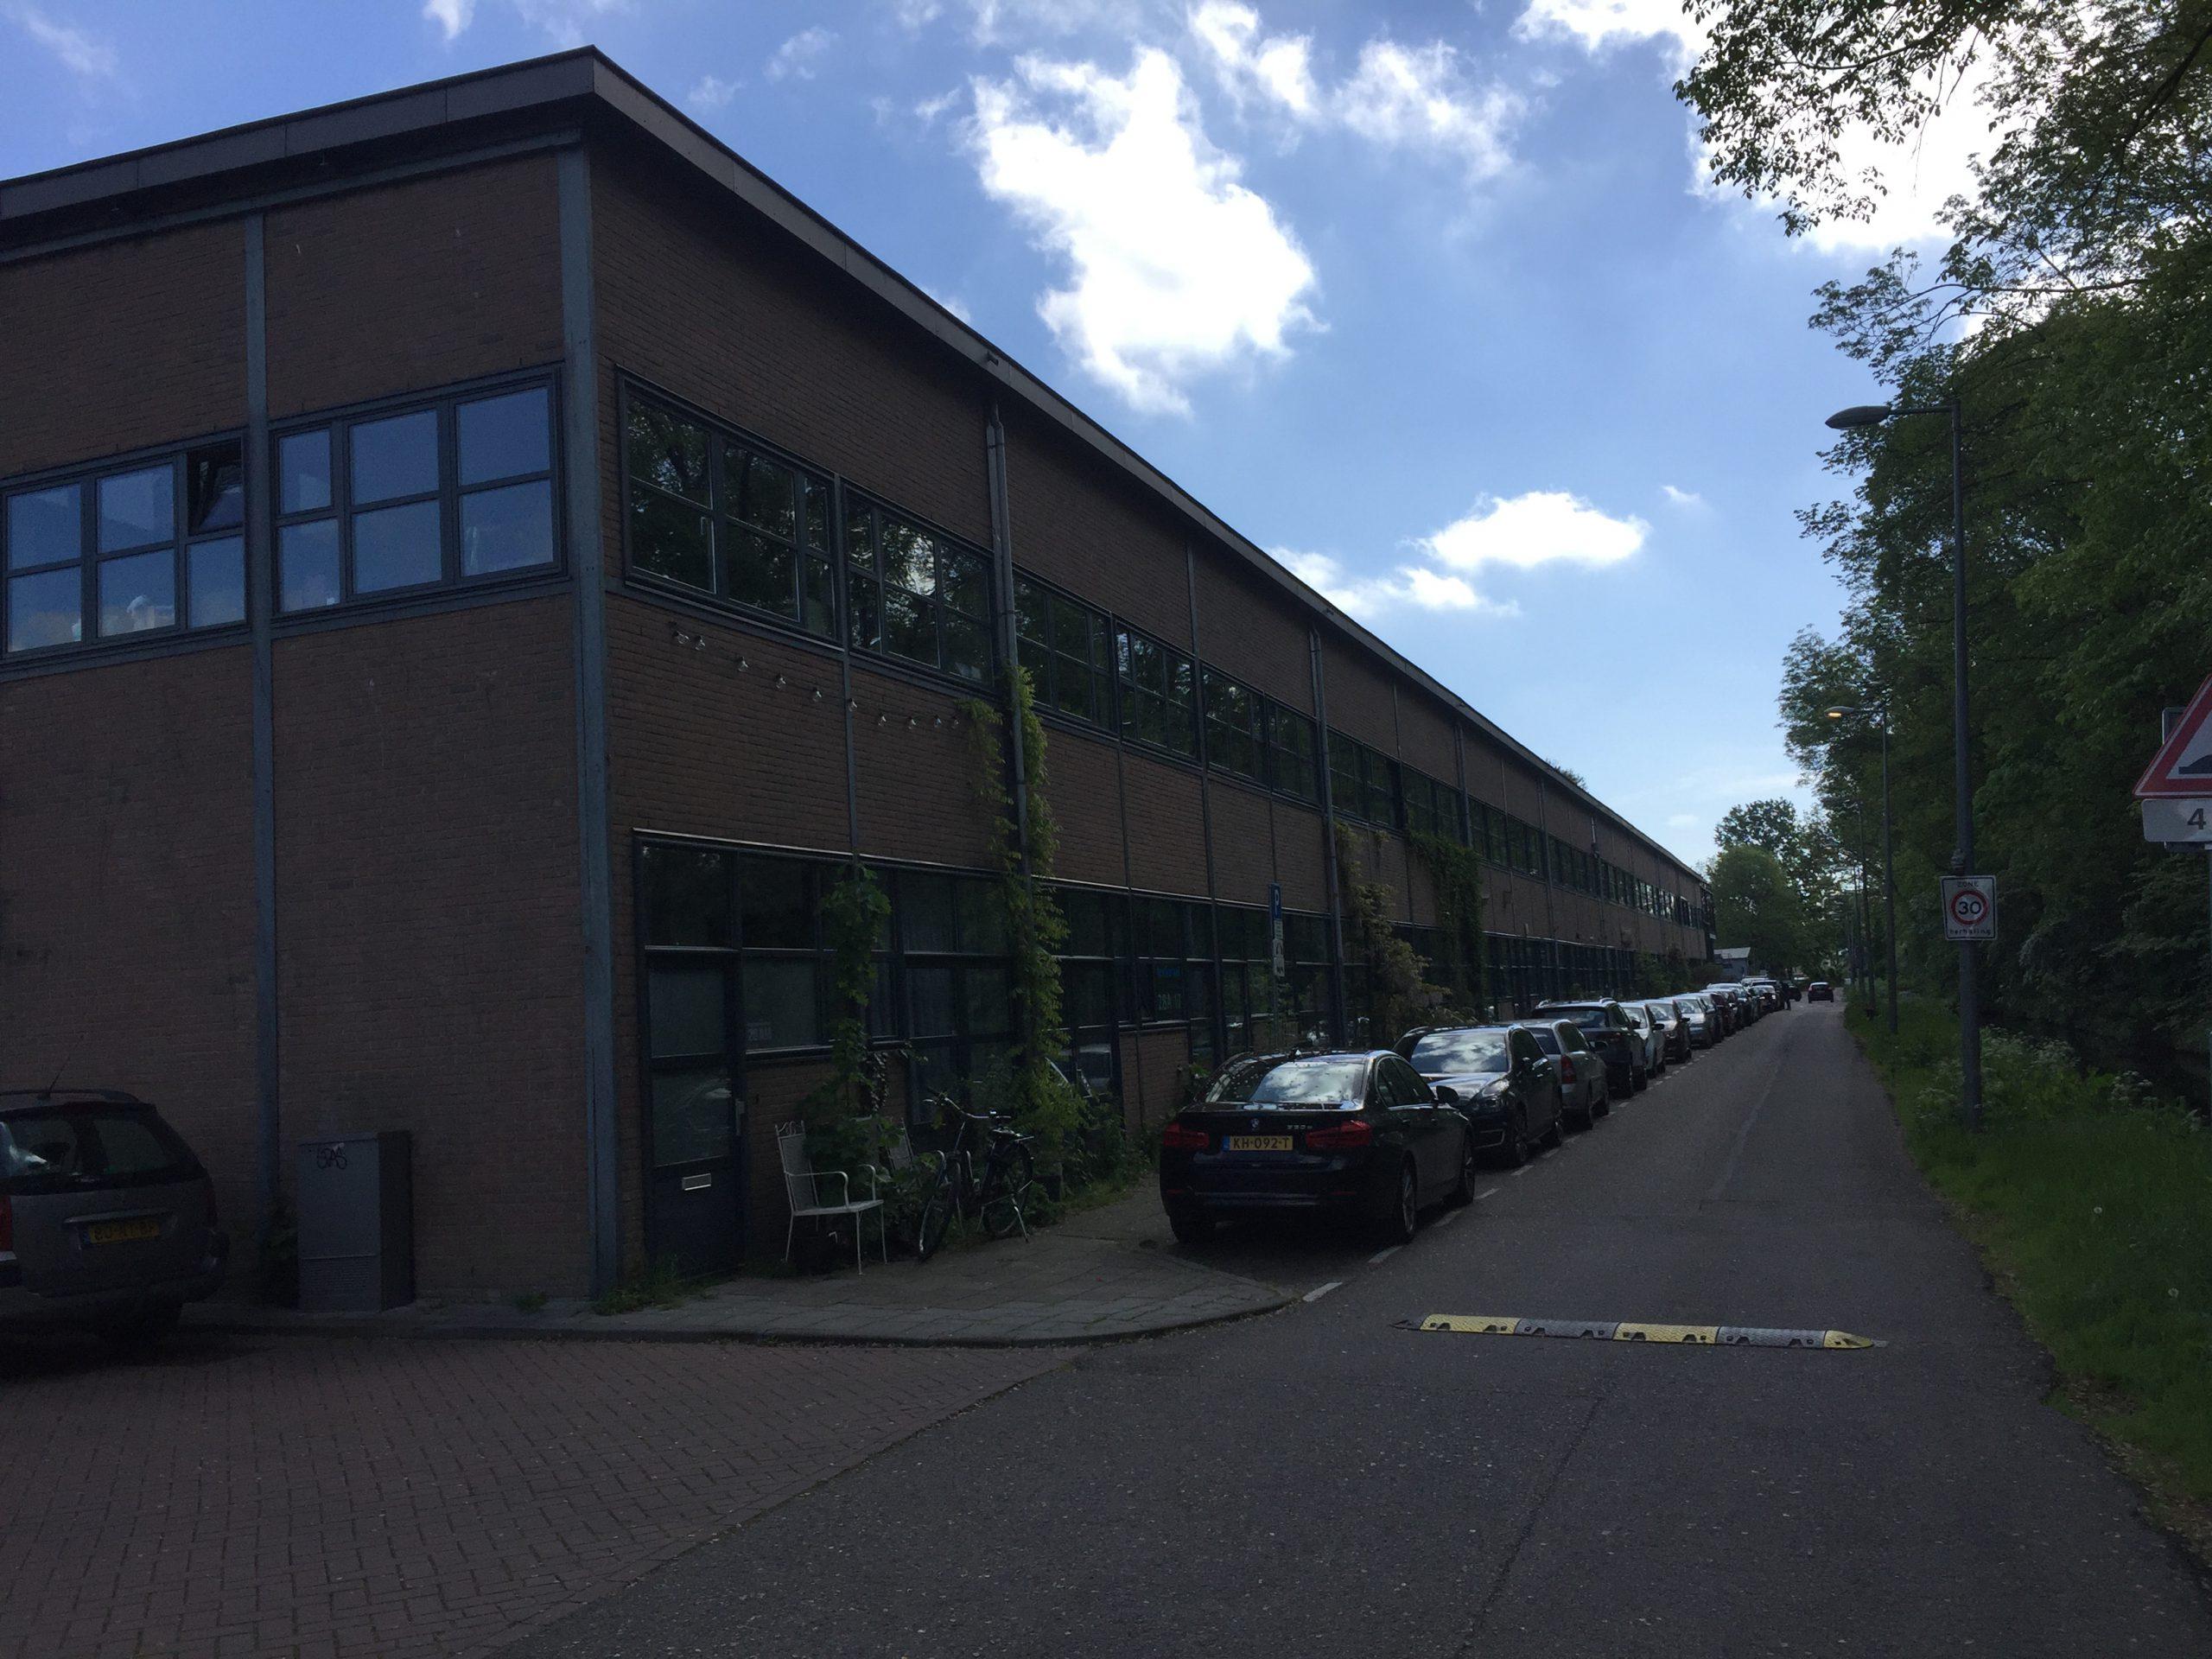 Spruijt Klimaat - Daikin multi split systeem Amsterdam Spruijt Klimaat